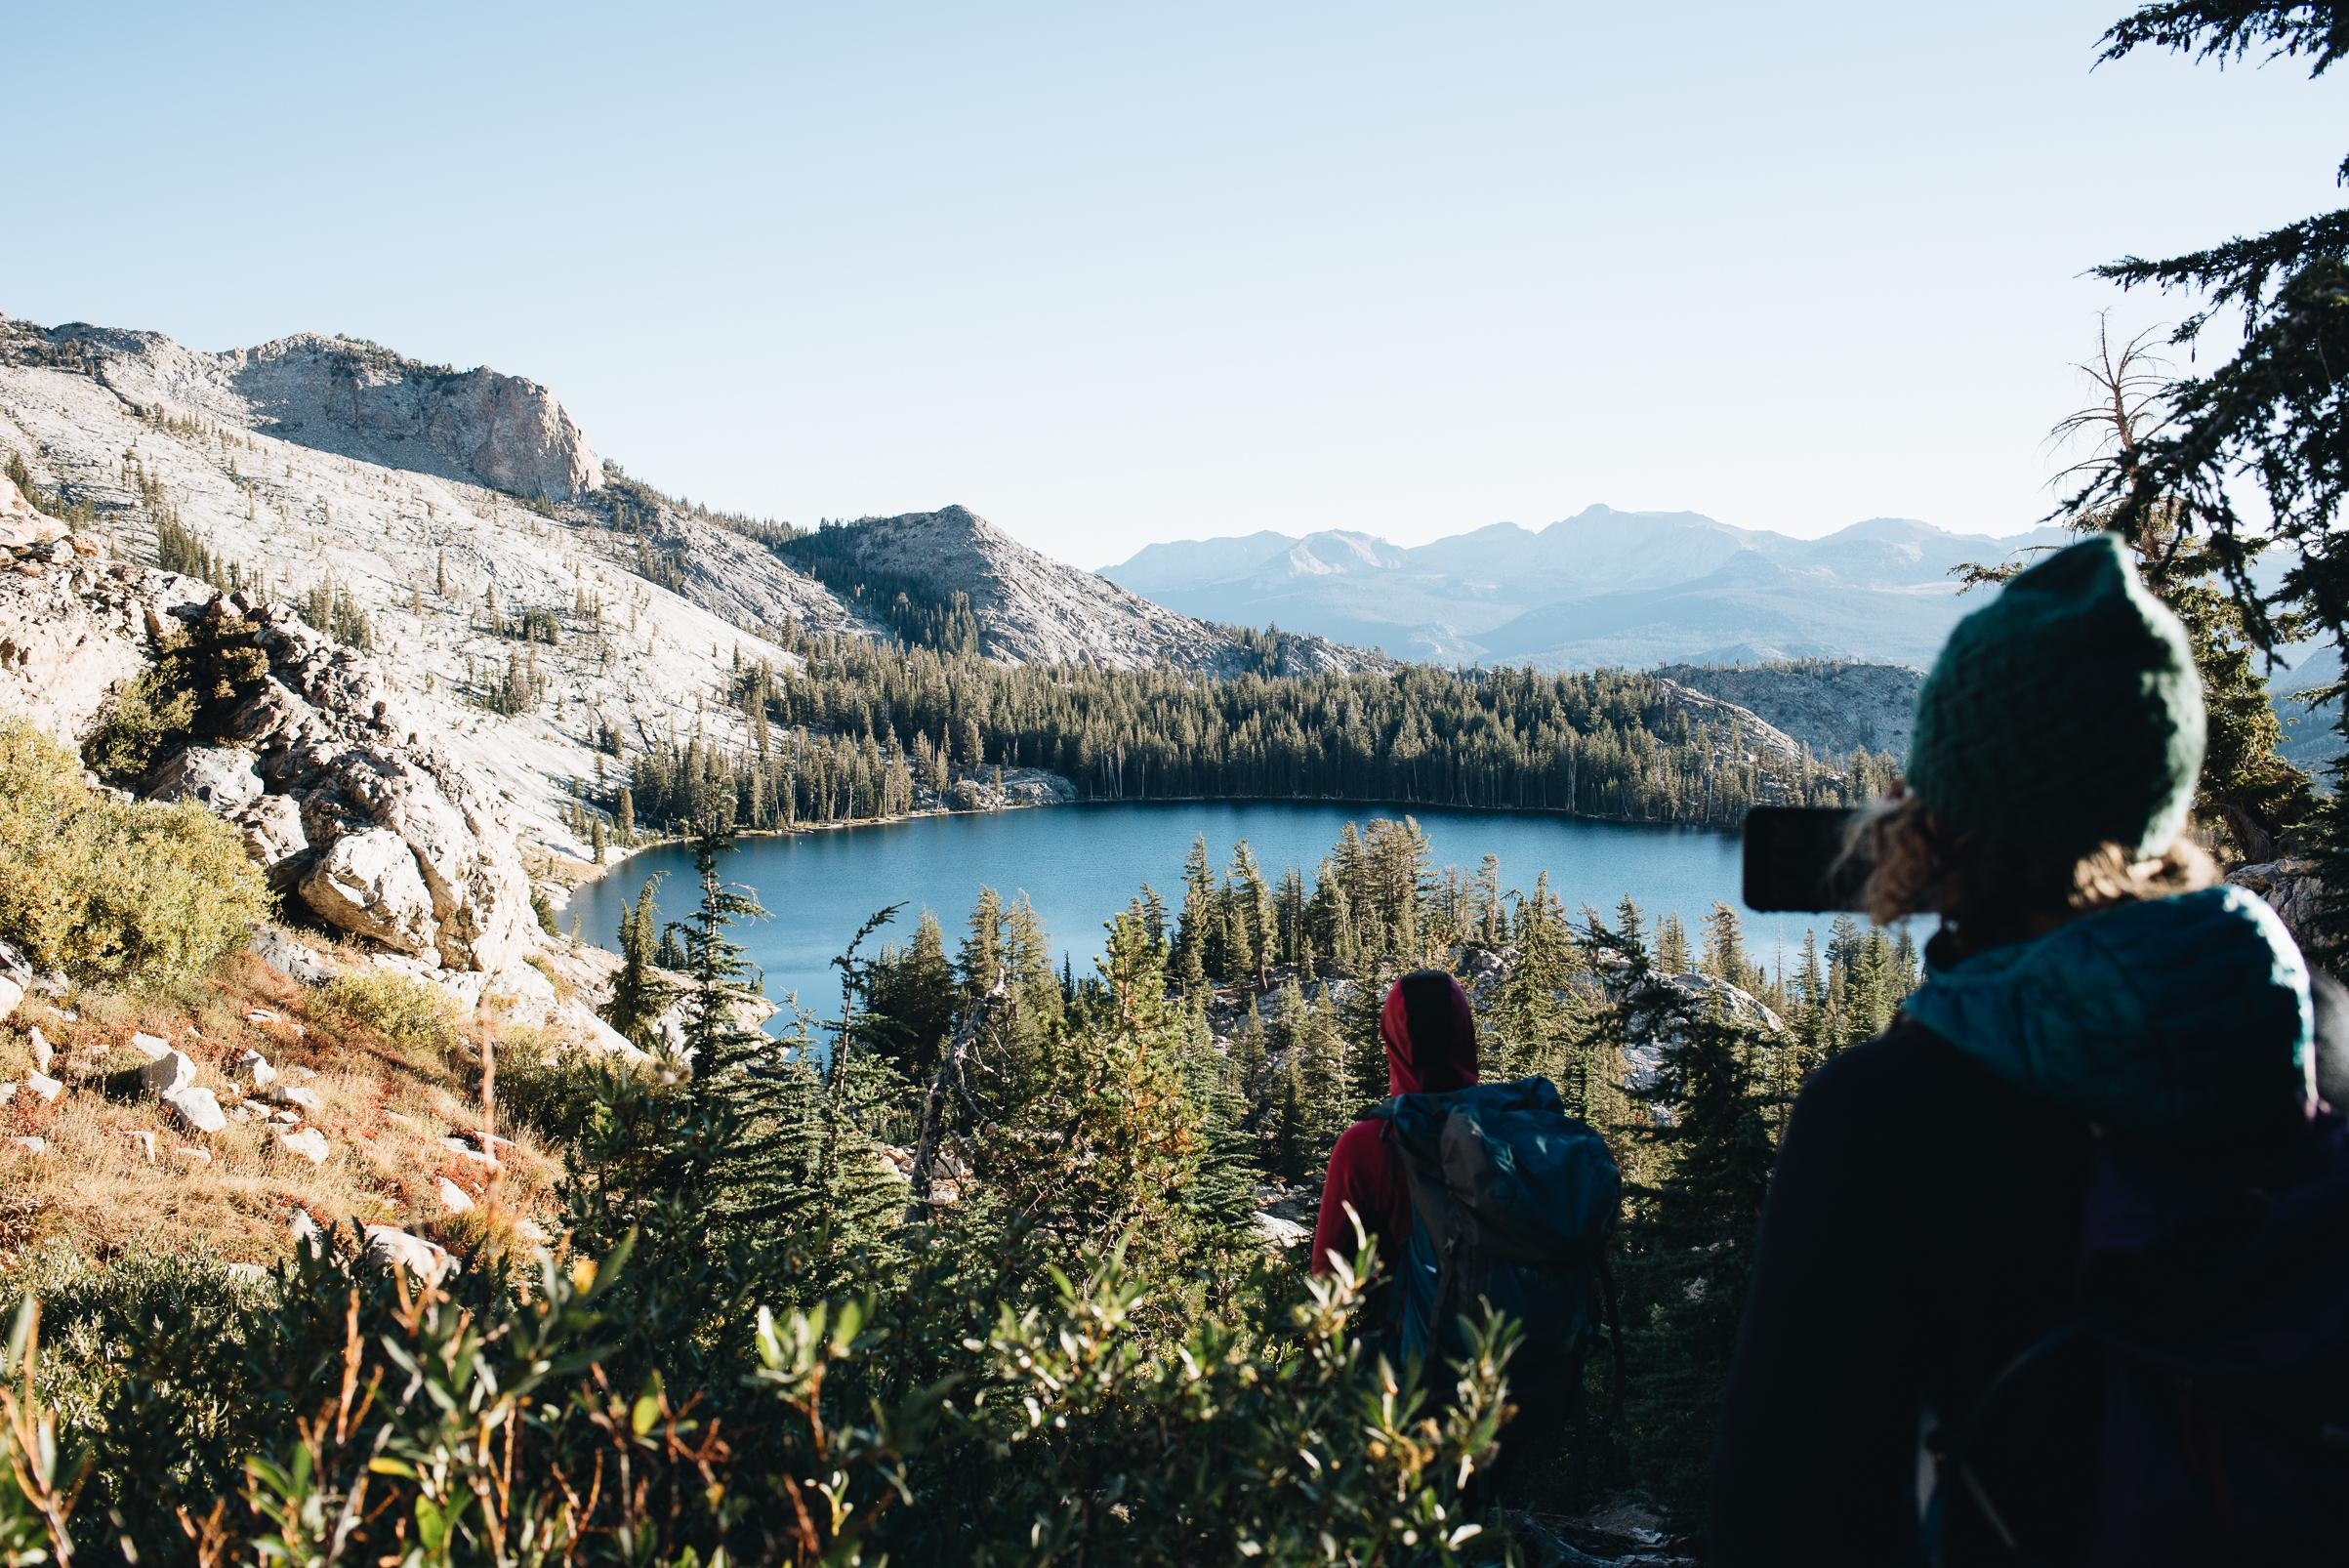 YosemiteBackpacking9.14_TrailMavens_LindseyShea-161.jpg